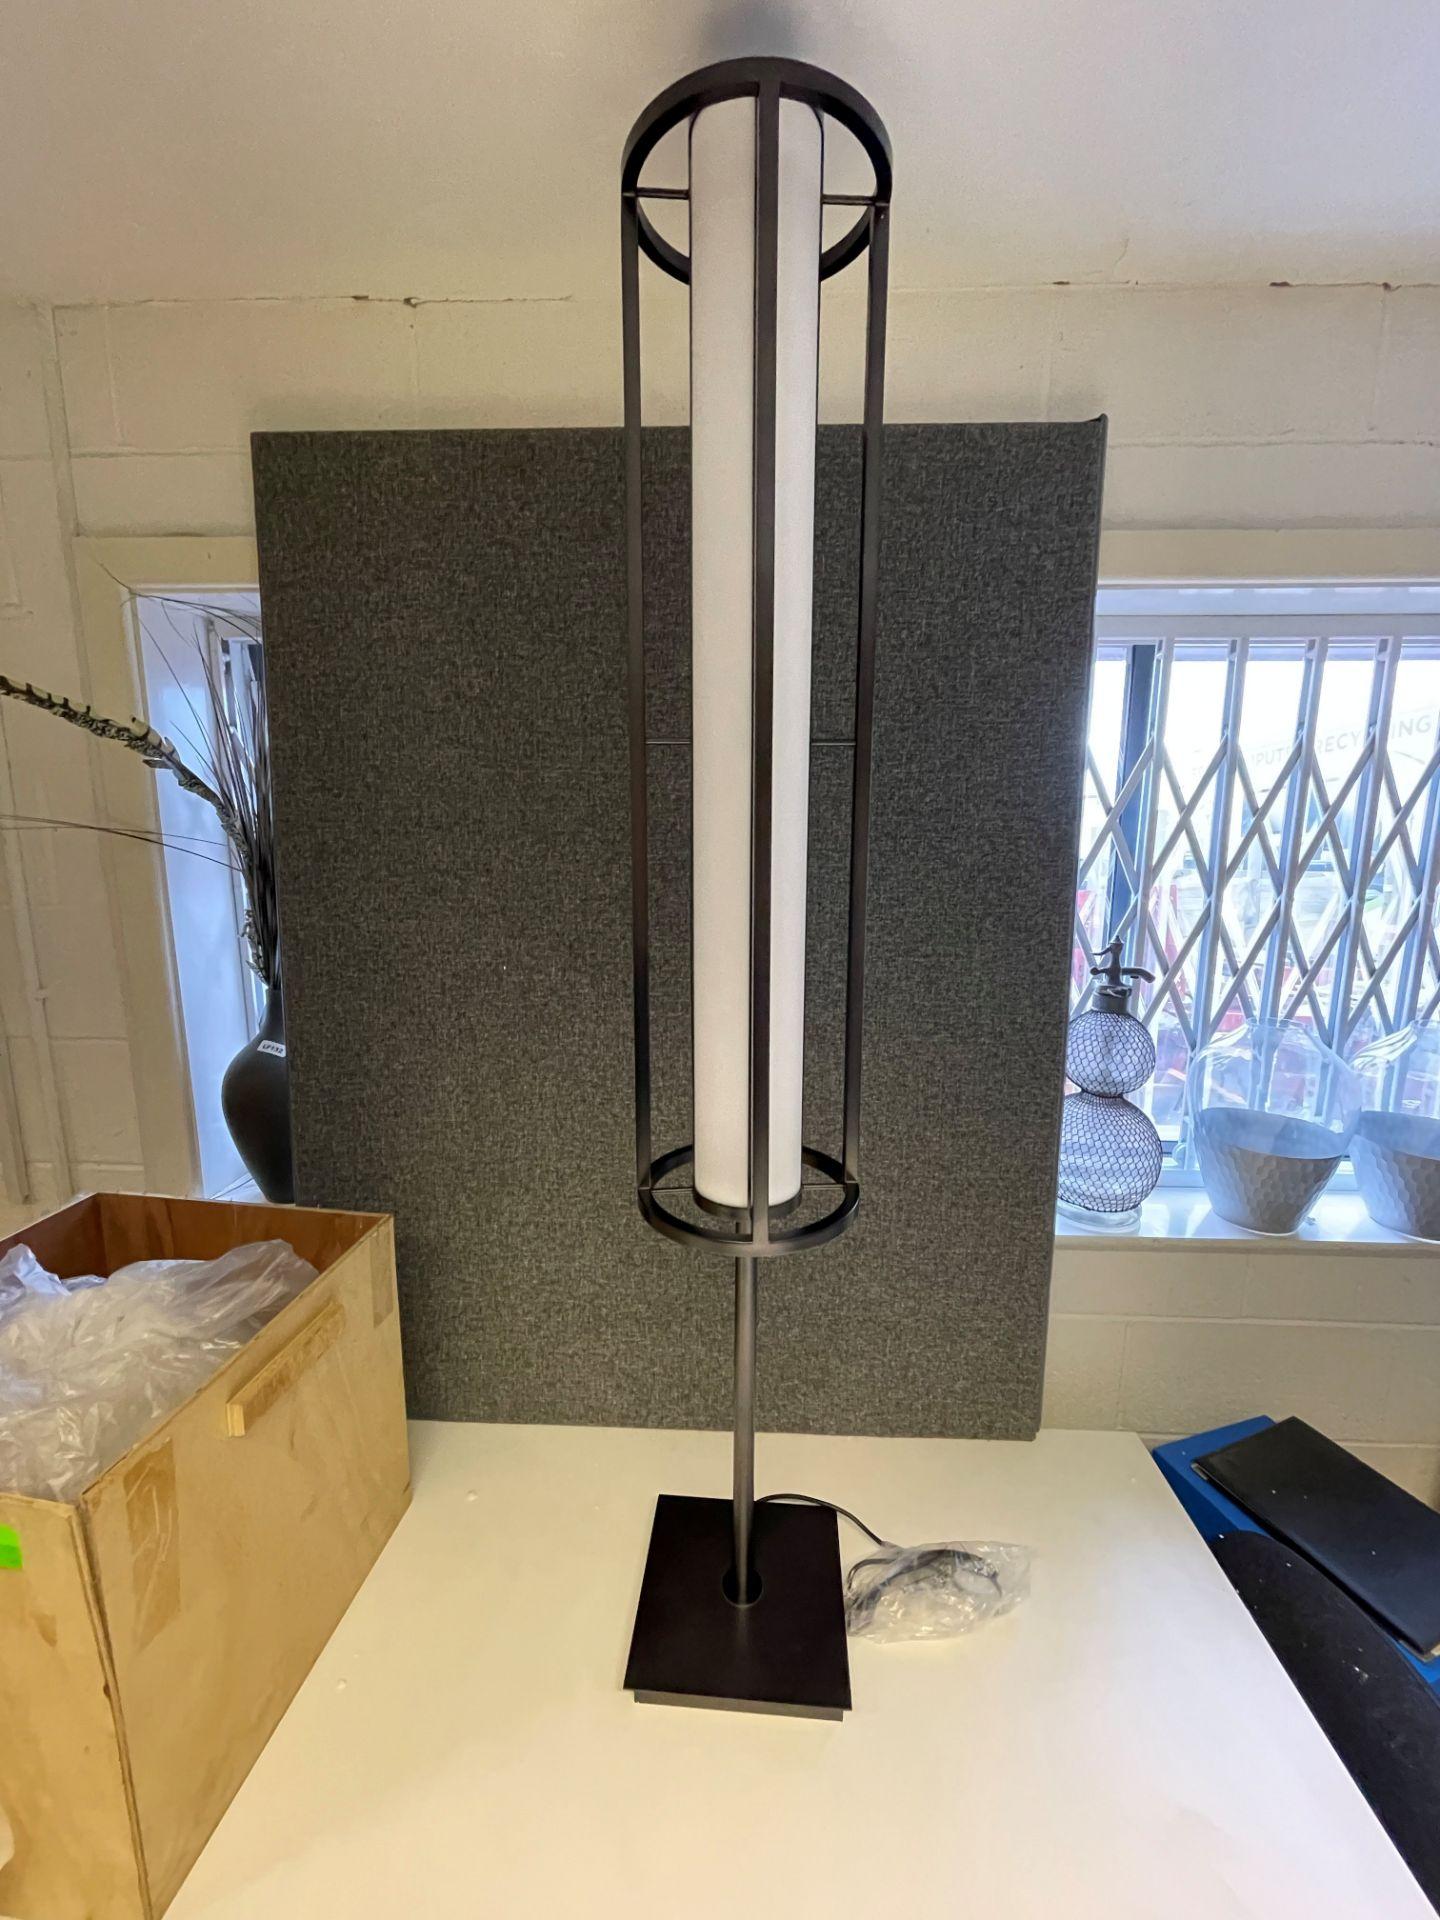 1 x Chelsom Art Deco Style Floor Lamp in Black/Bronze Height 161cm x 30cm Diameter - Ref: CHL197 - - Image 5 of 10